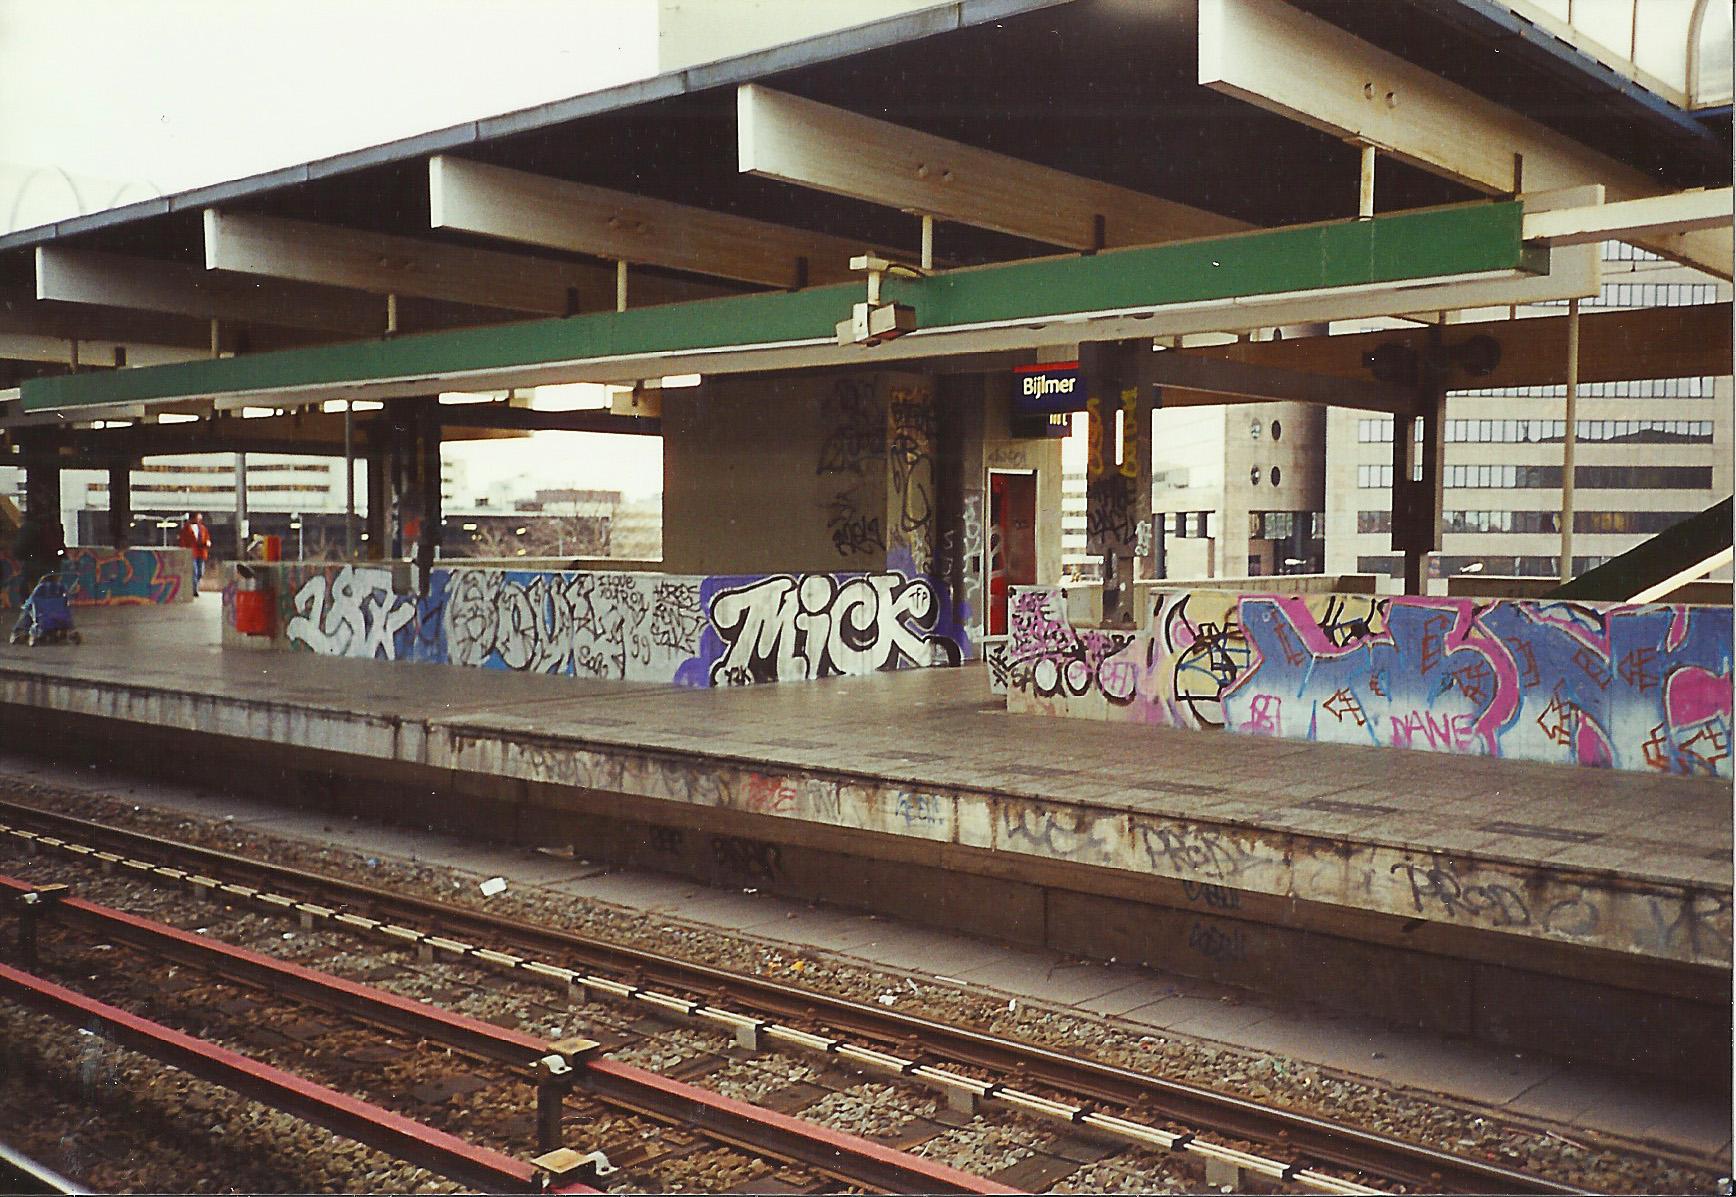 Amsterdam Bijlmer, 199?